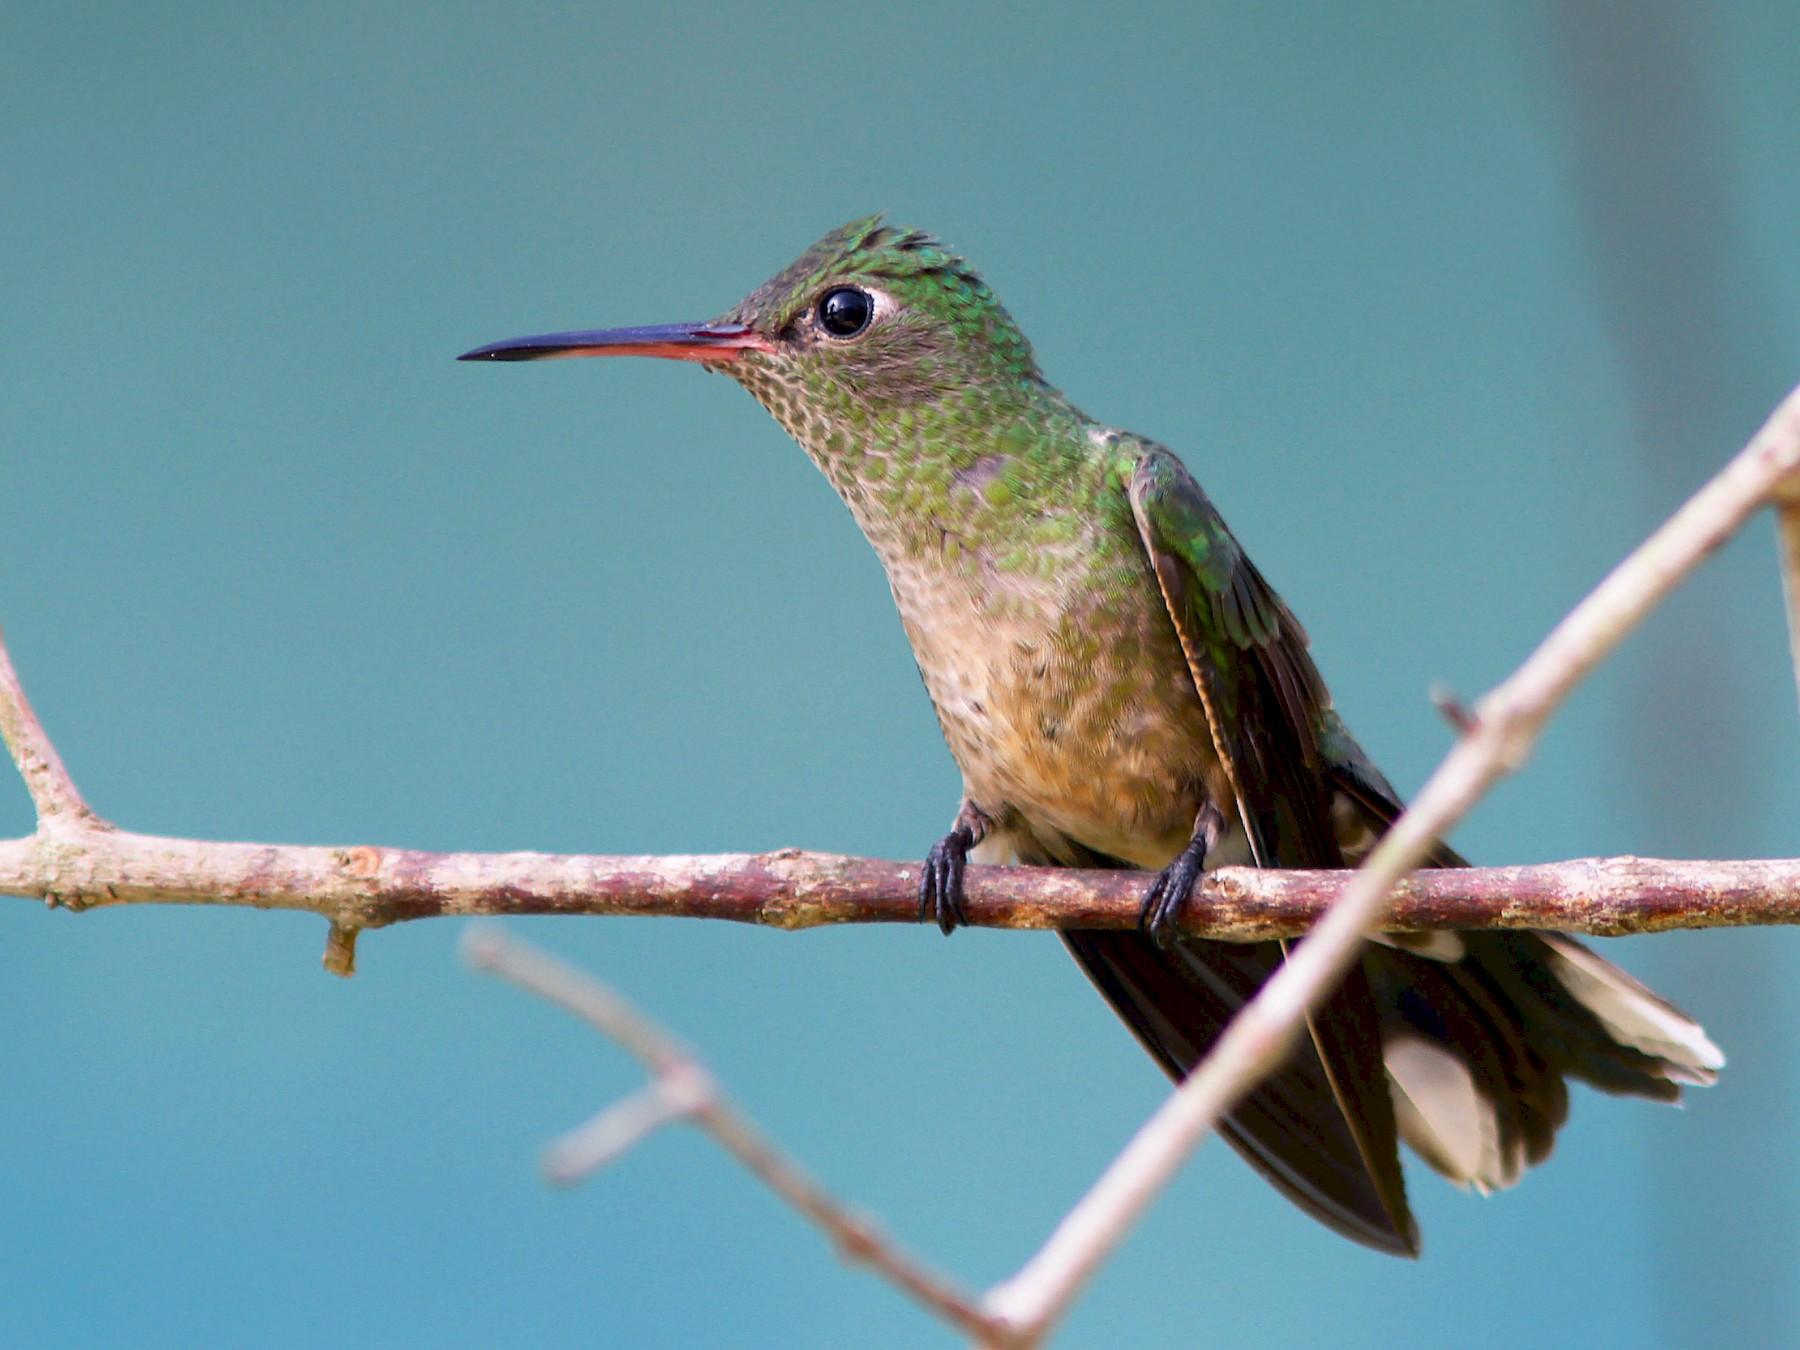 Scaly-breasted Hummingbird - Bradley Hacker